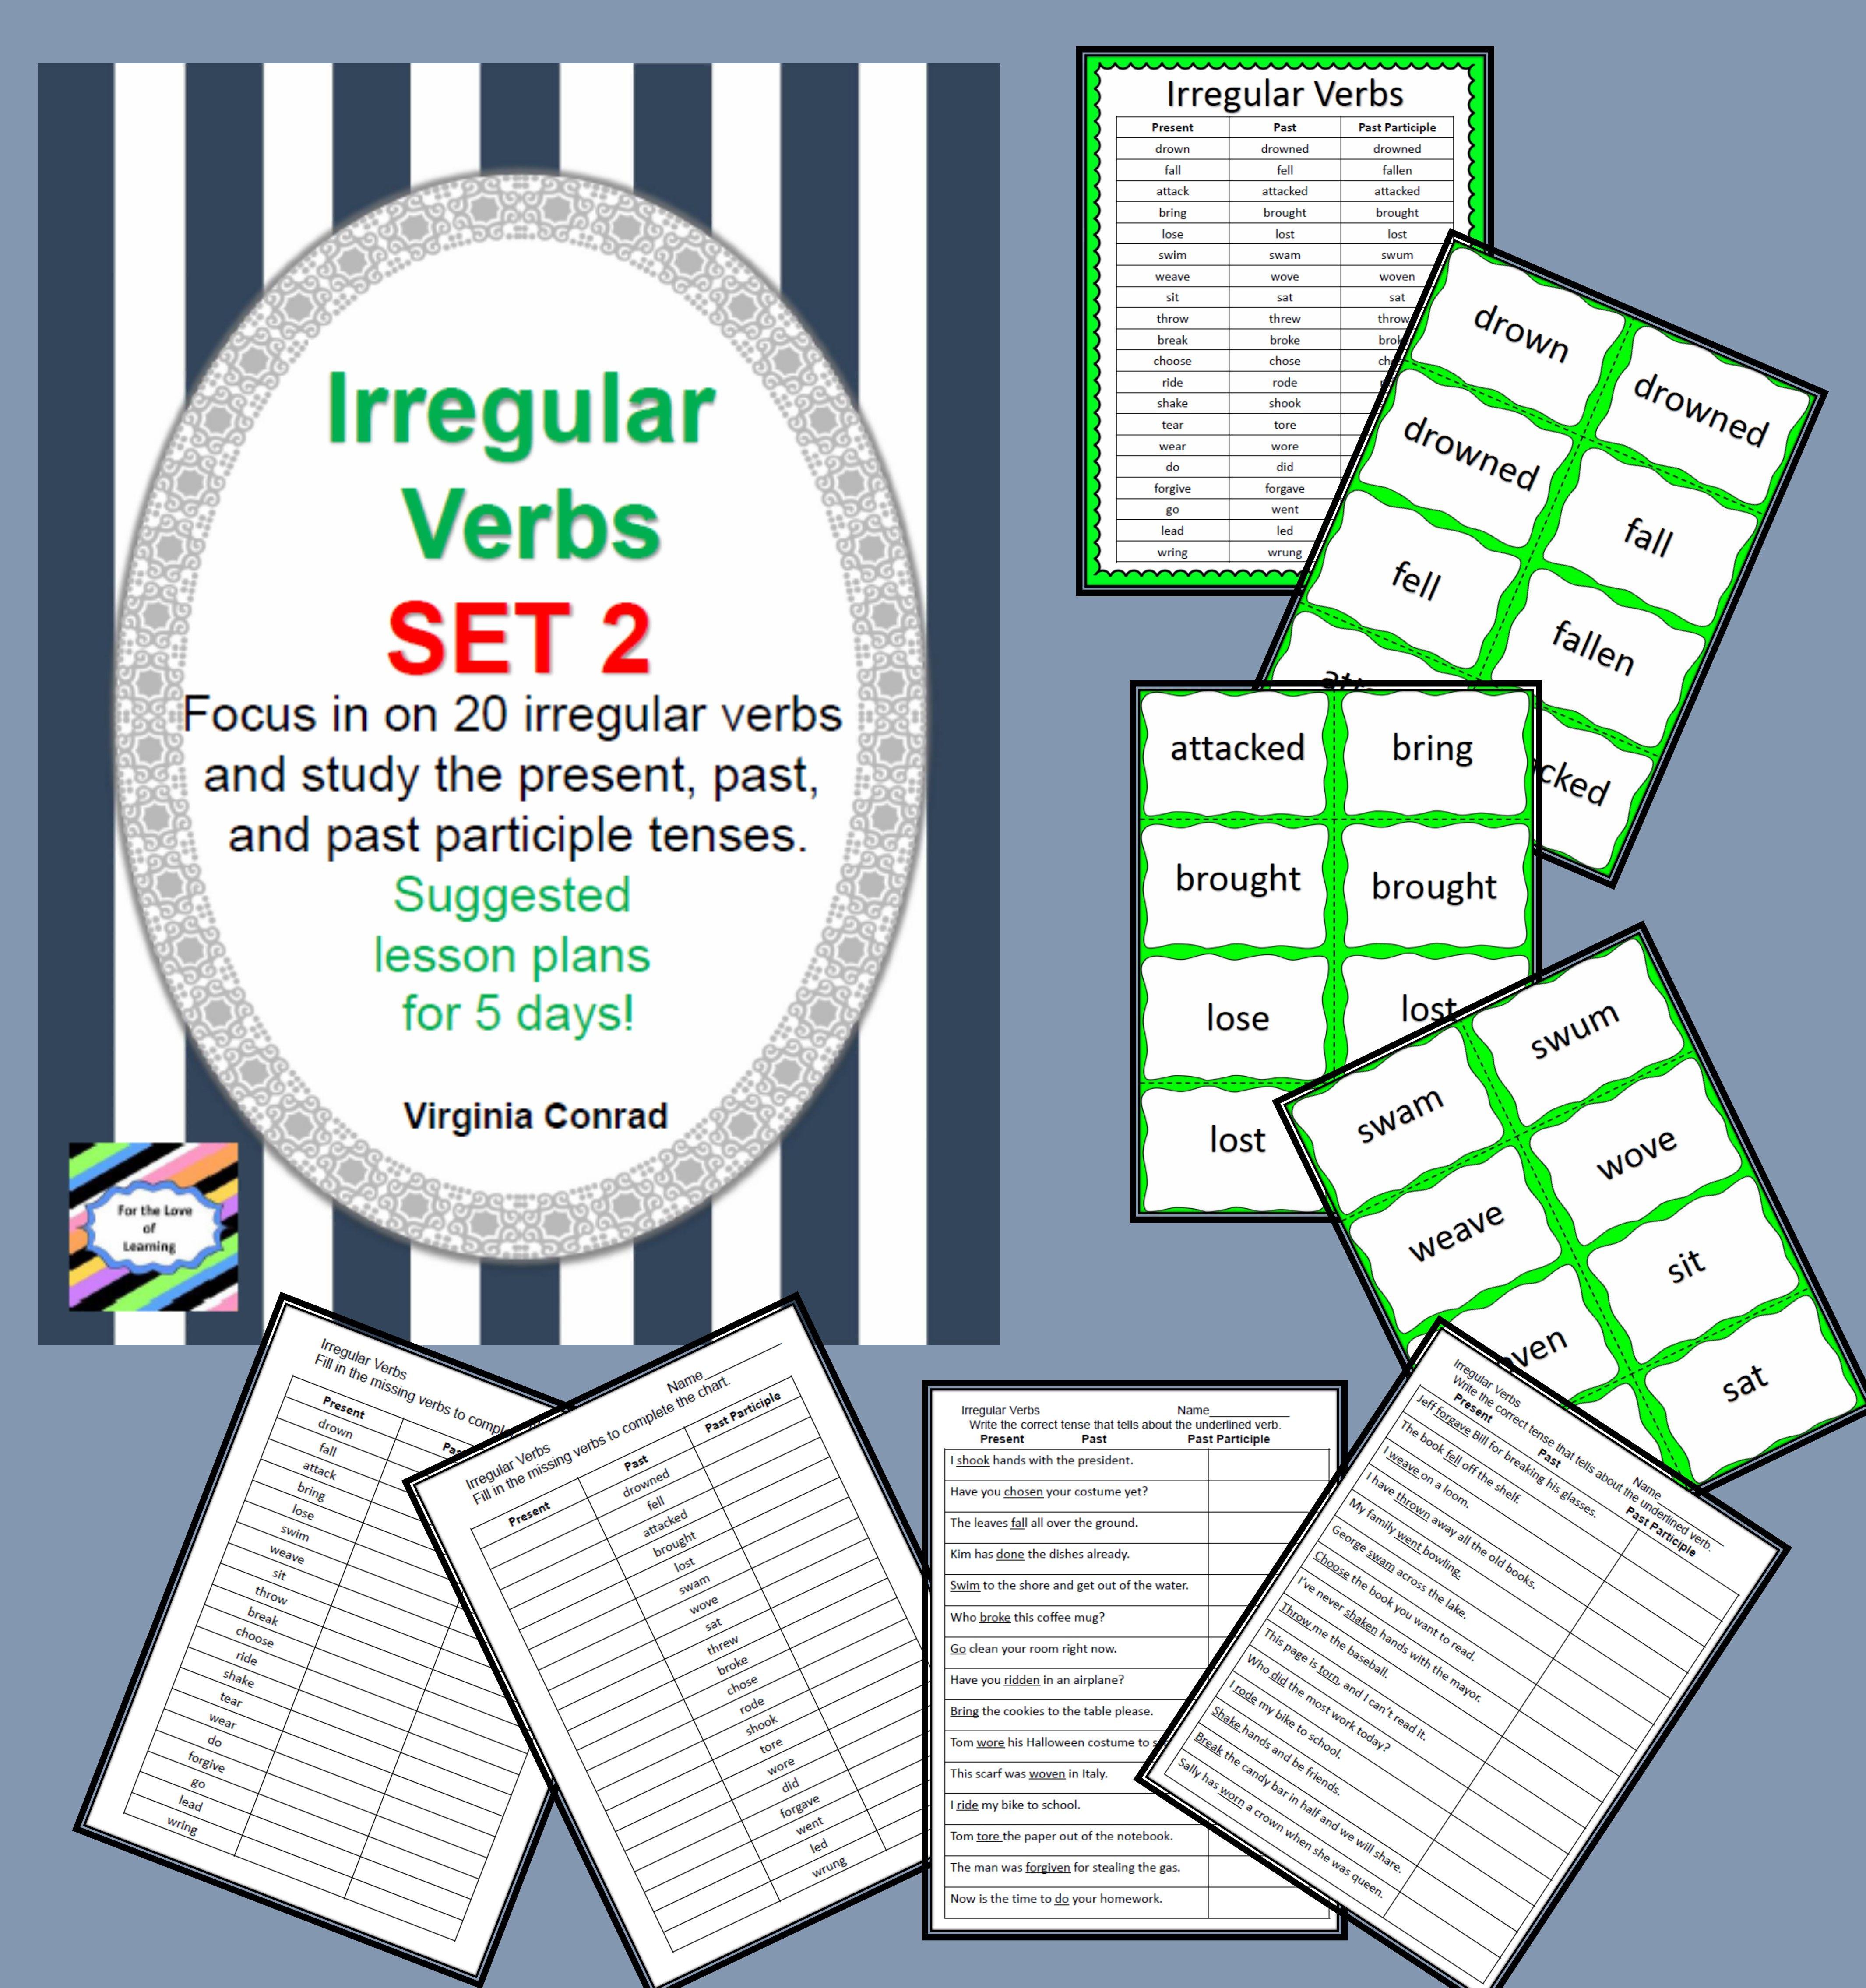 Irregular Verbs Set 2